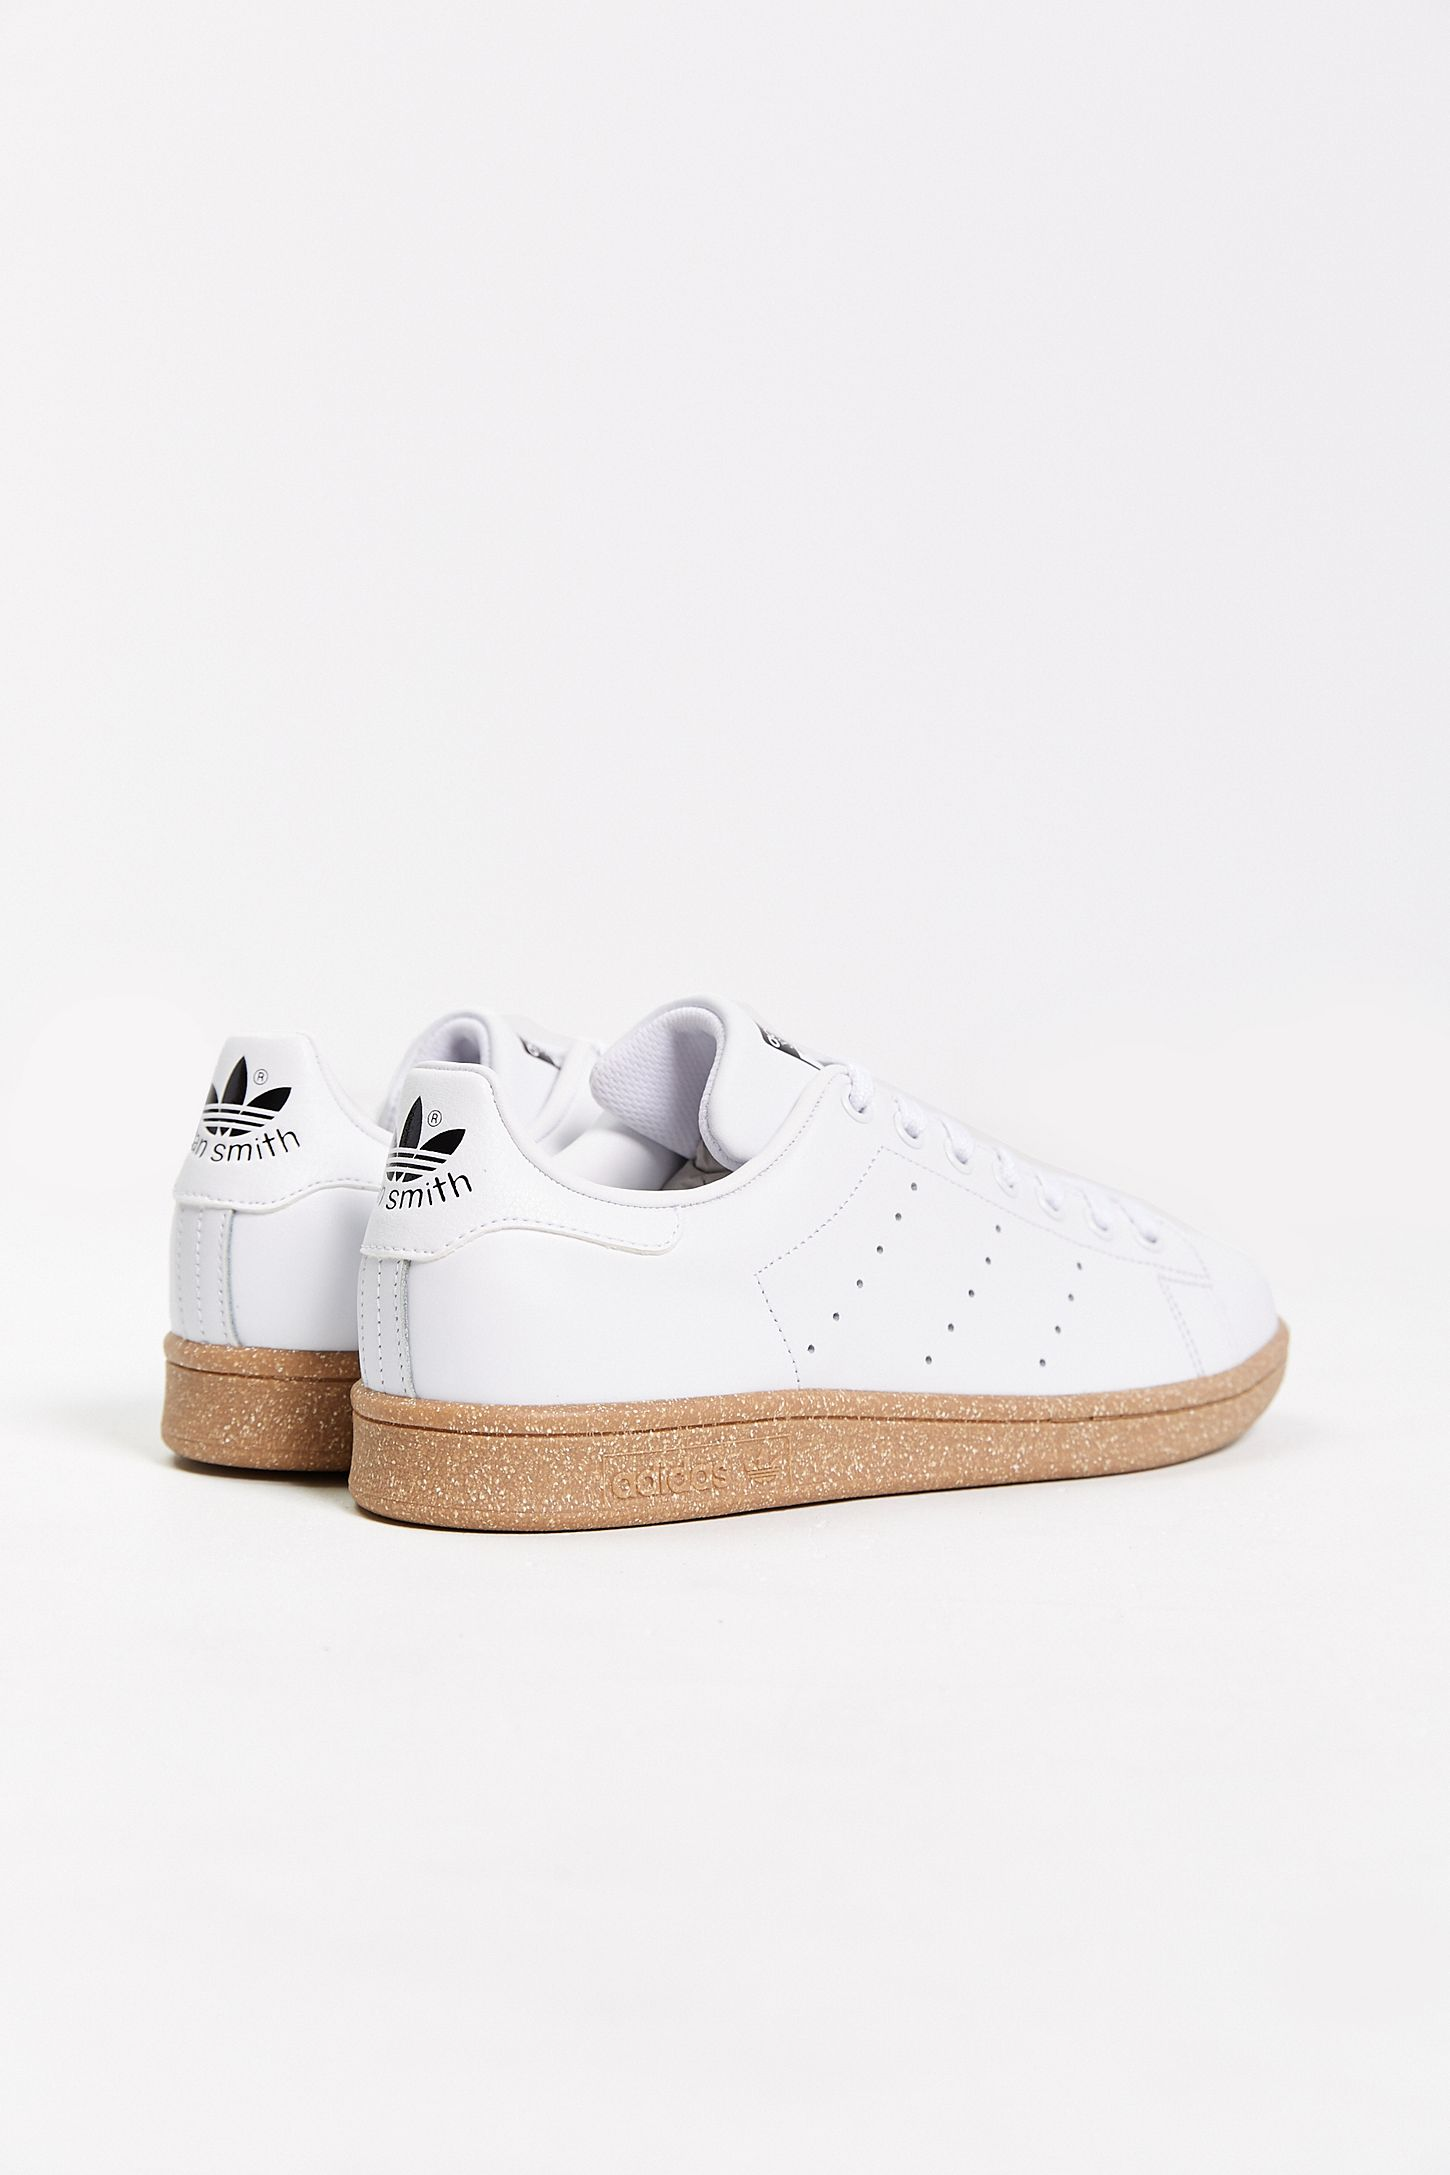 1fbbf8236d0bbc Slide View  6  adidas Originals Stan Smith Gumsole Sneaker